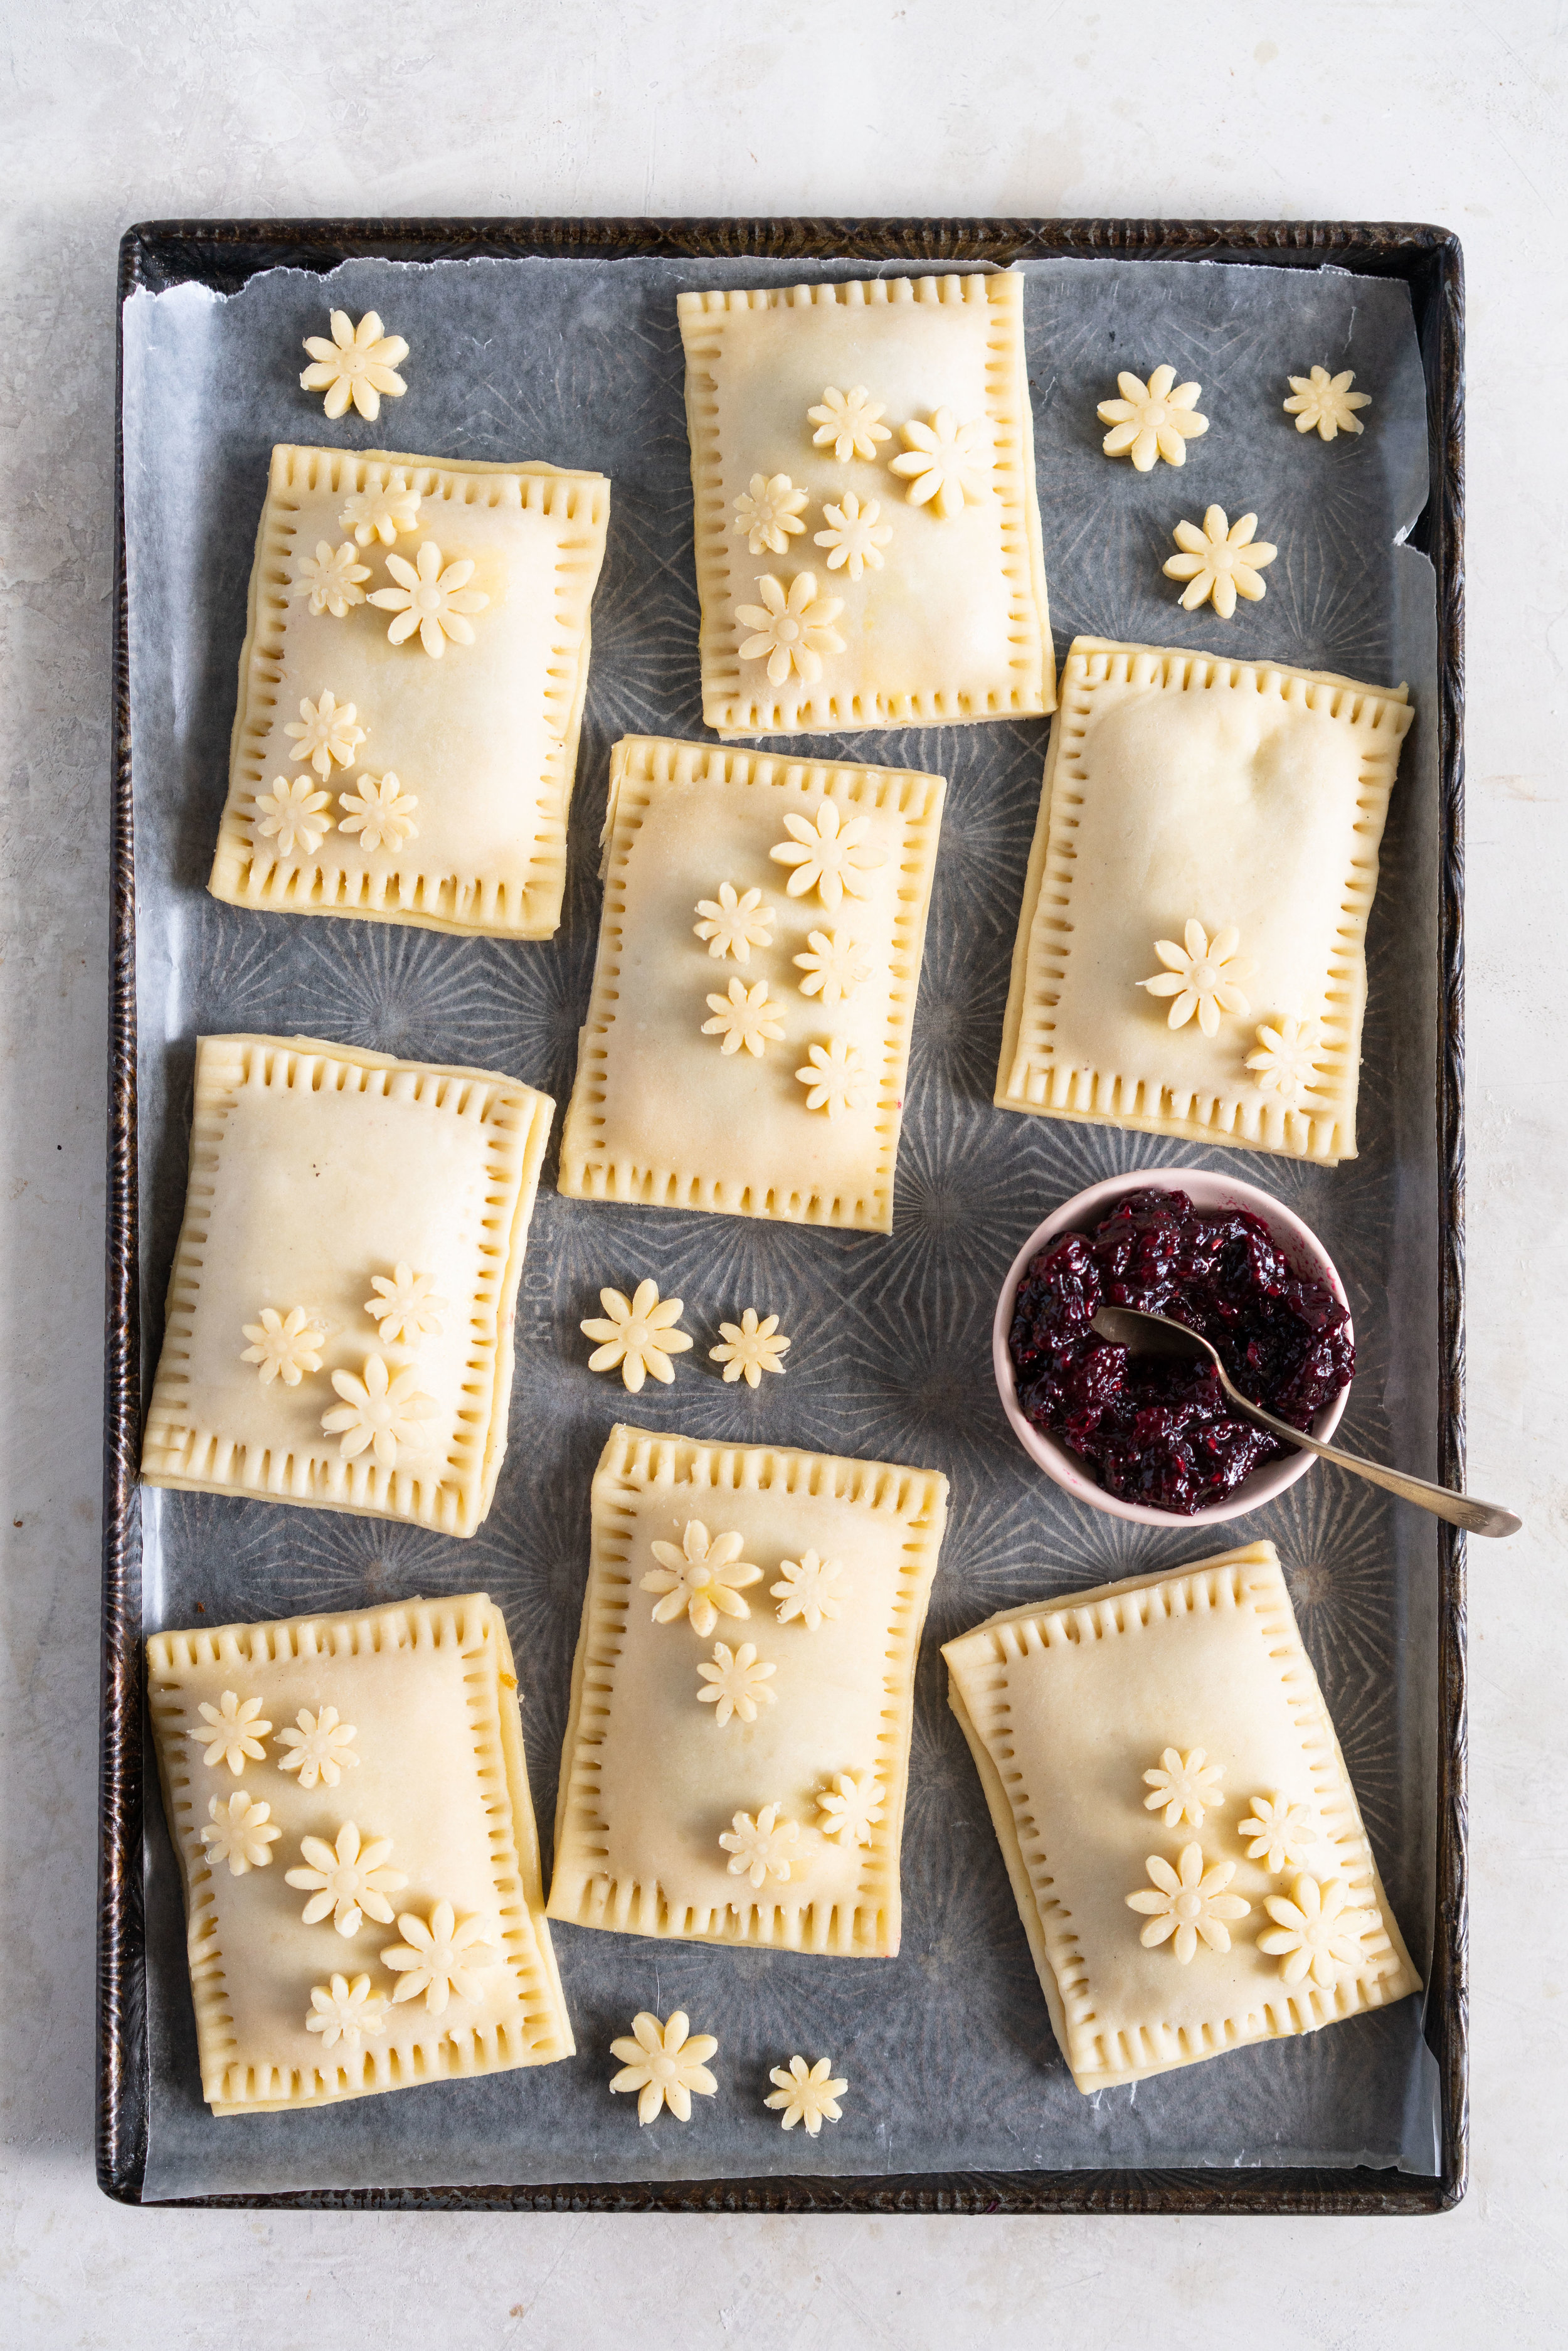 tray of mixed berry jam and cream cheese hand pies.jpg